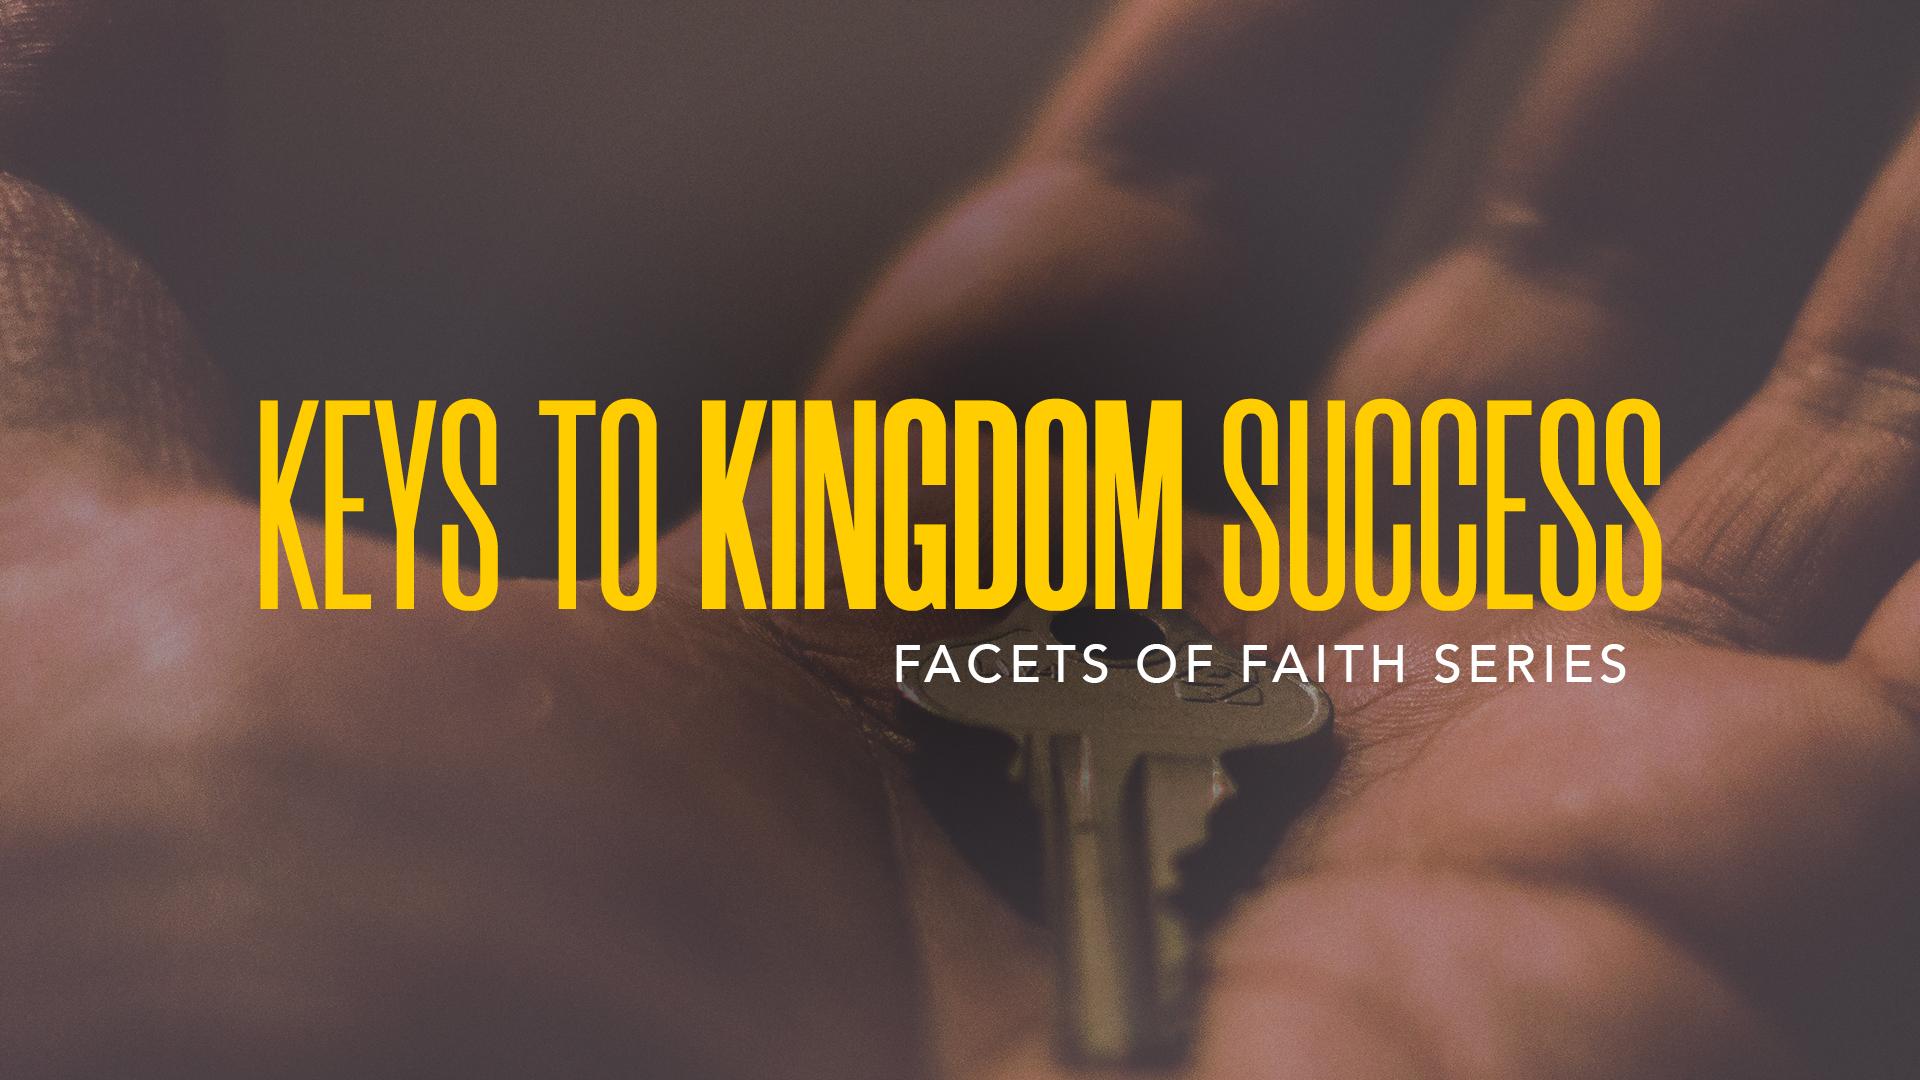 Keys to Kingdom Success.jpg